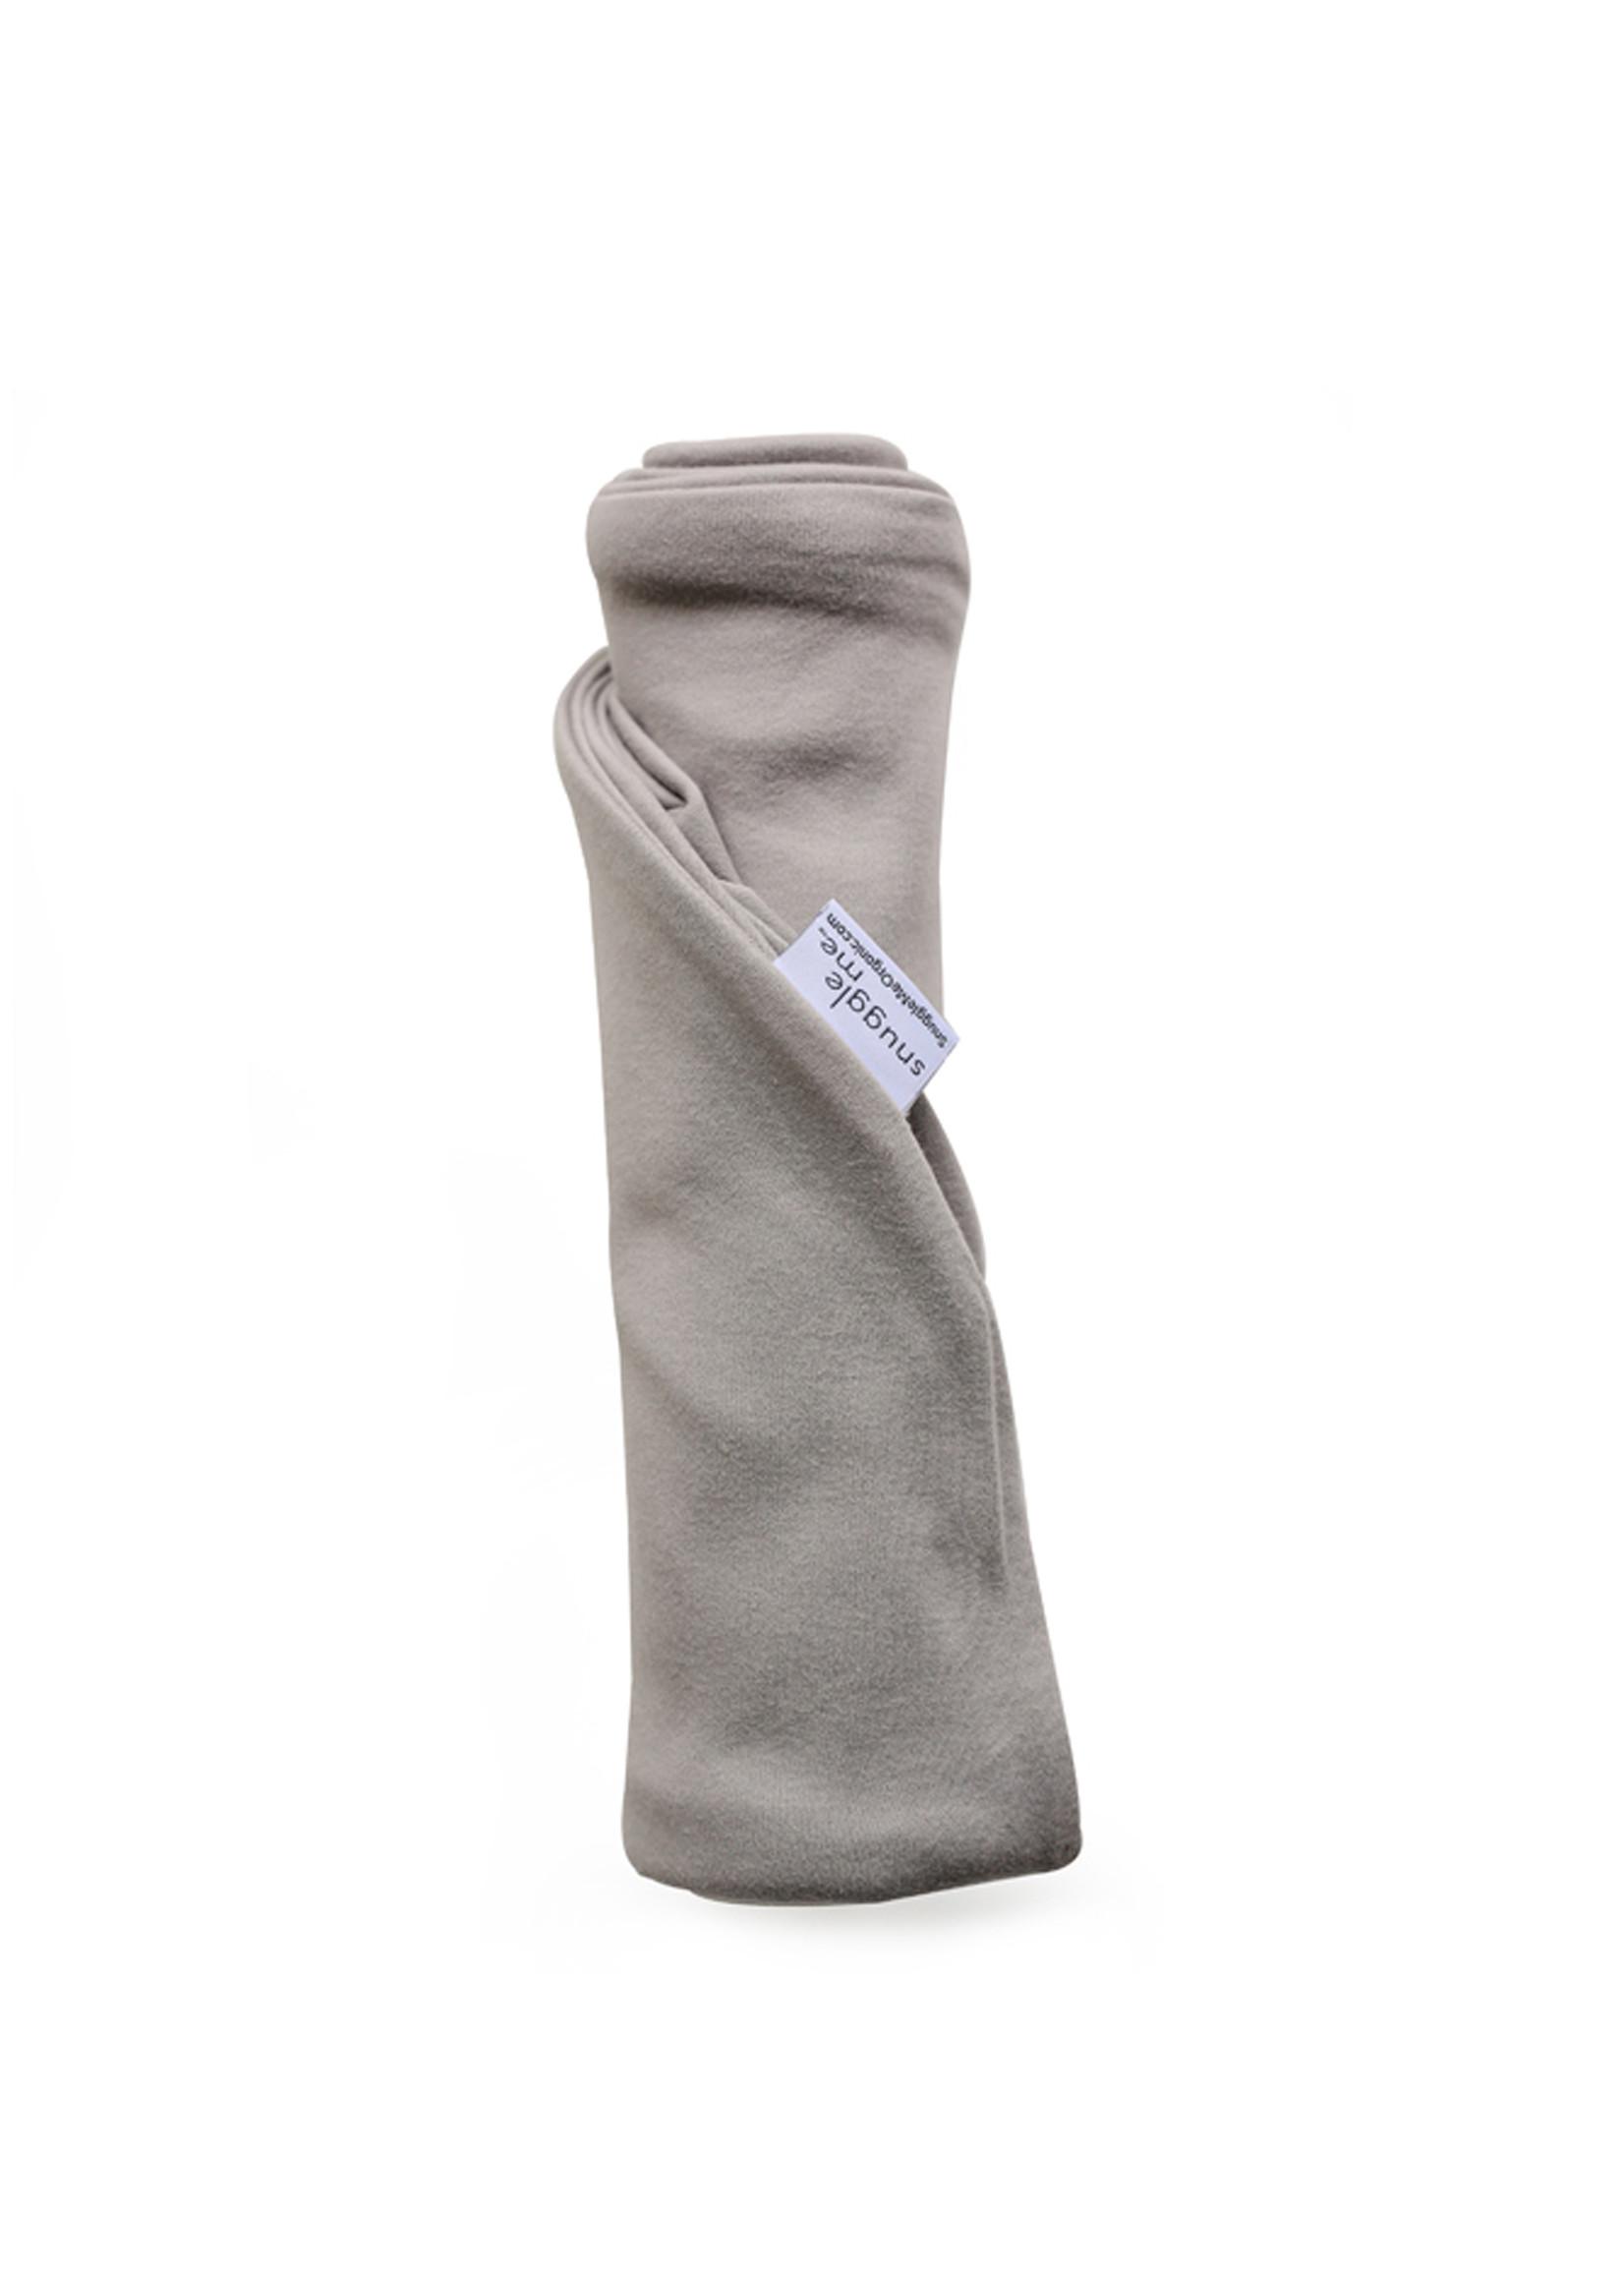 Snuggle Me Infant Lounger Cover - Wren